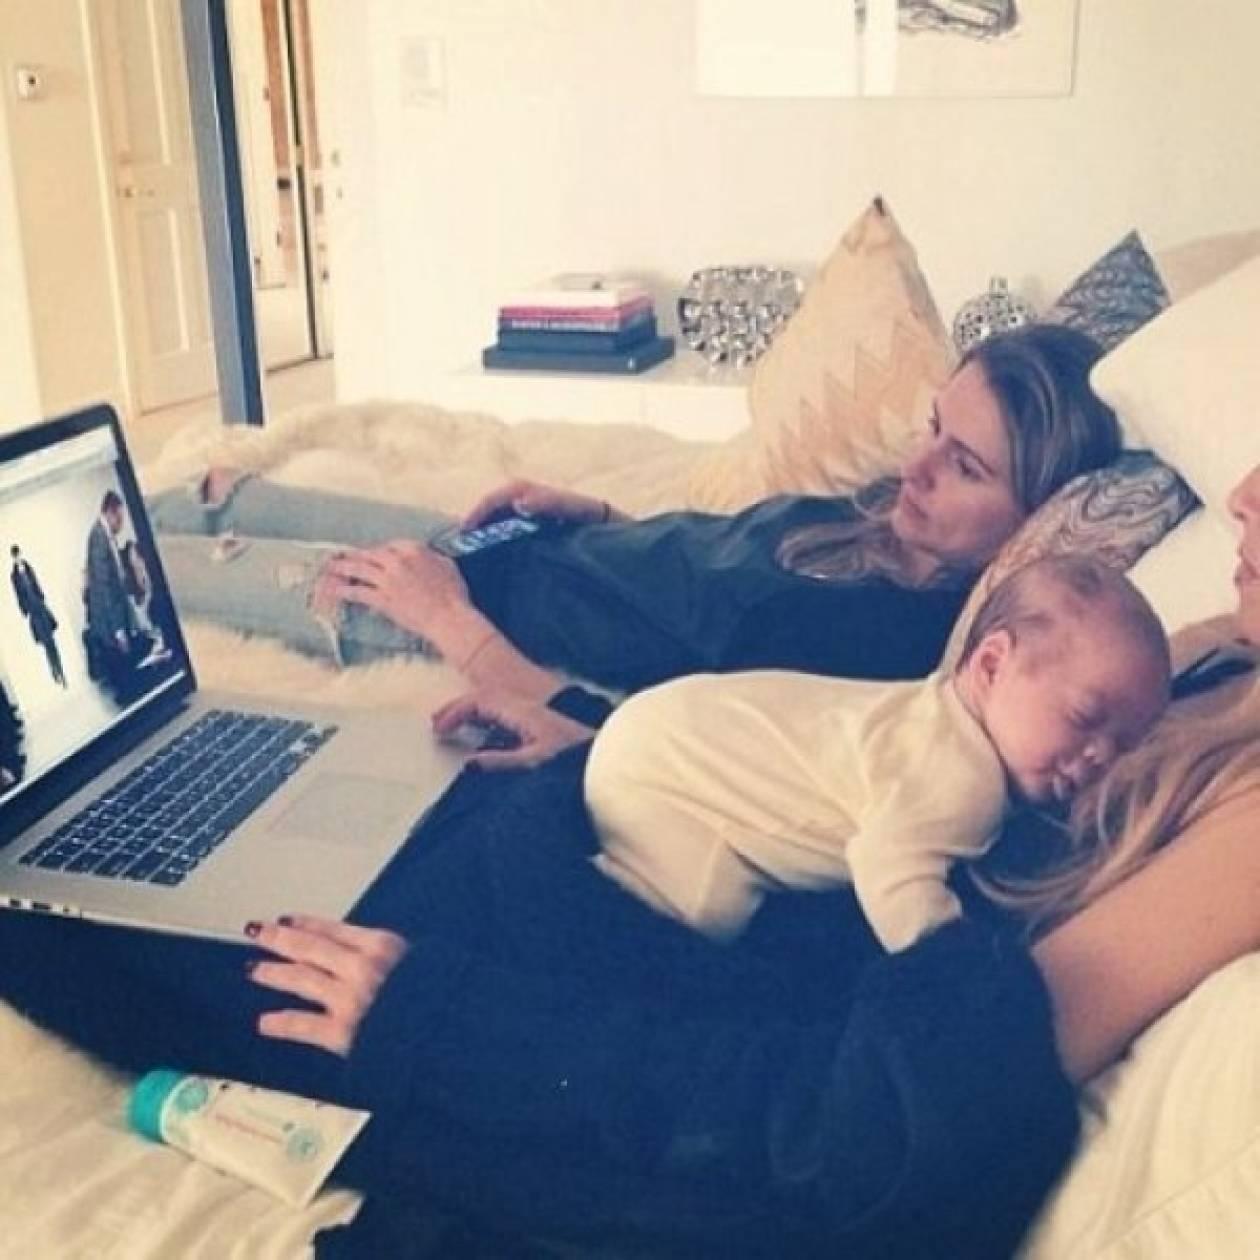 Kάντο όπως η Gisele! Ποια διάσημη μαμά δουλεύει με το μωρό της αγκαλιά